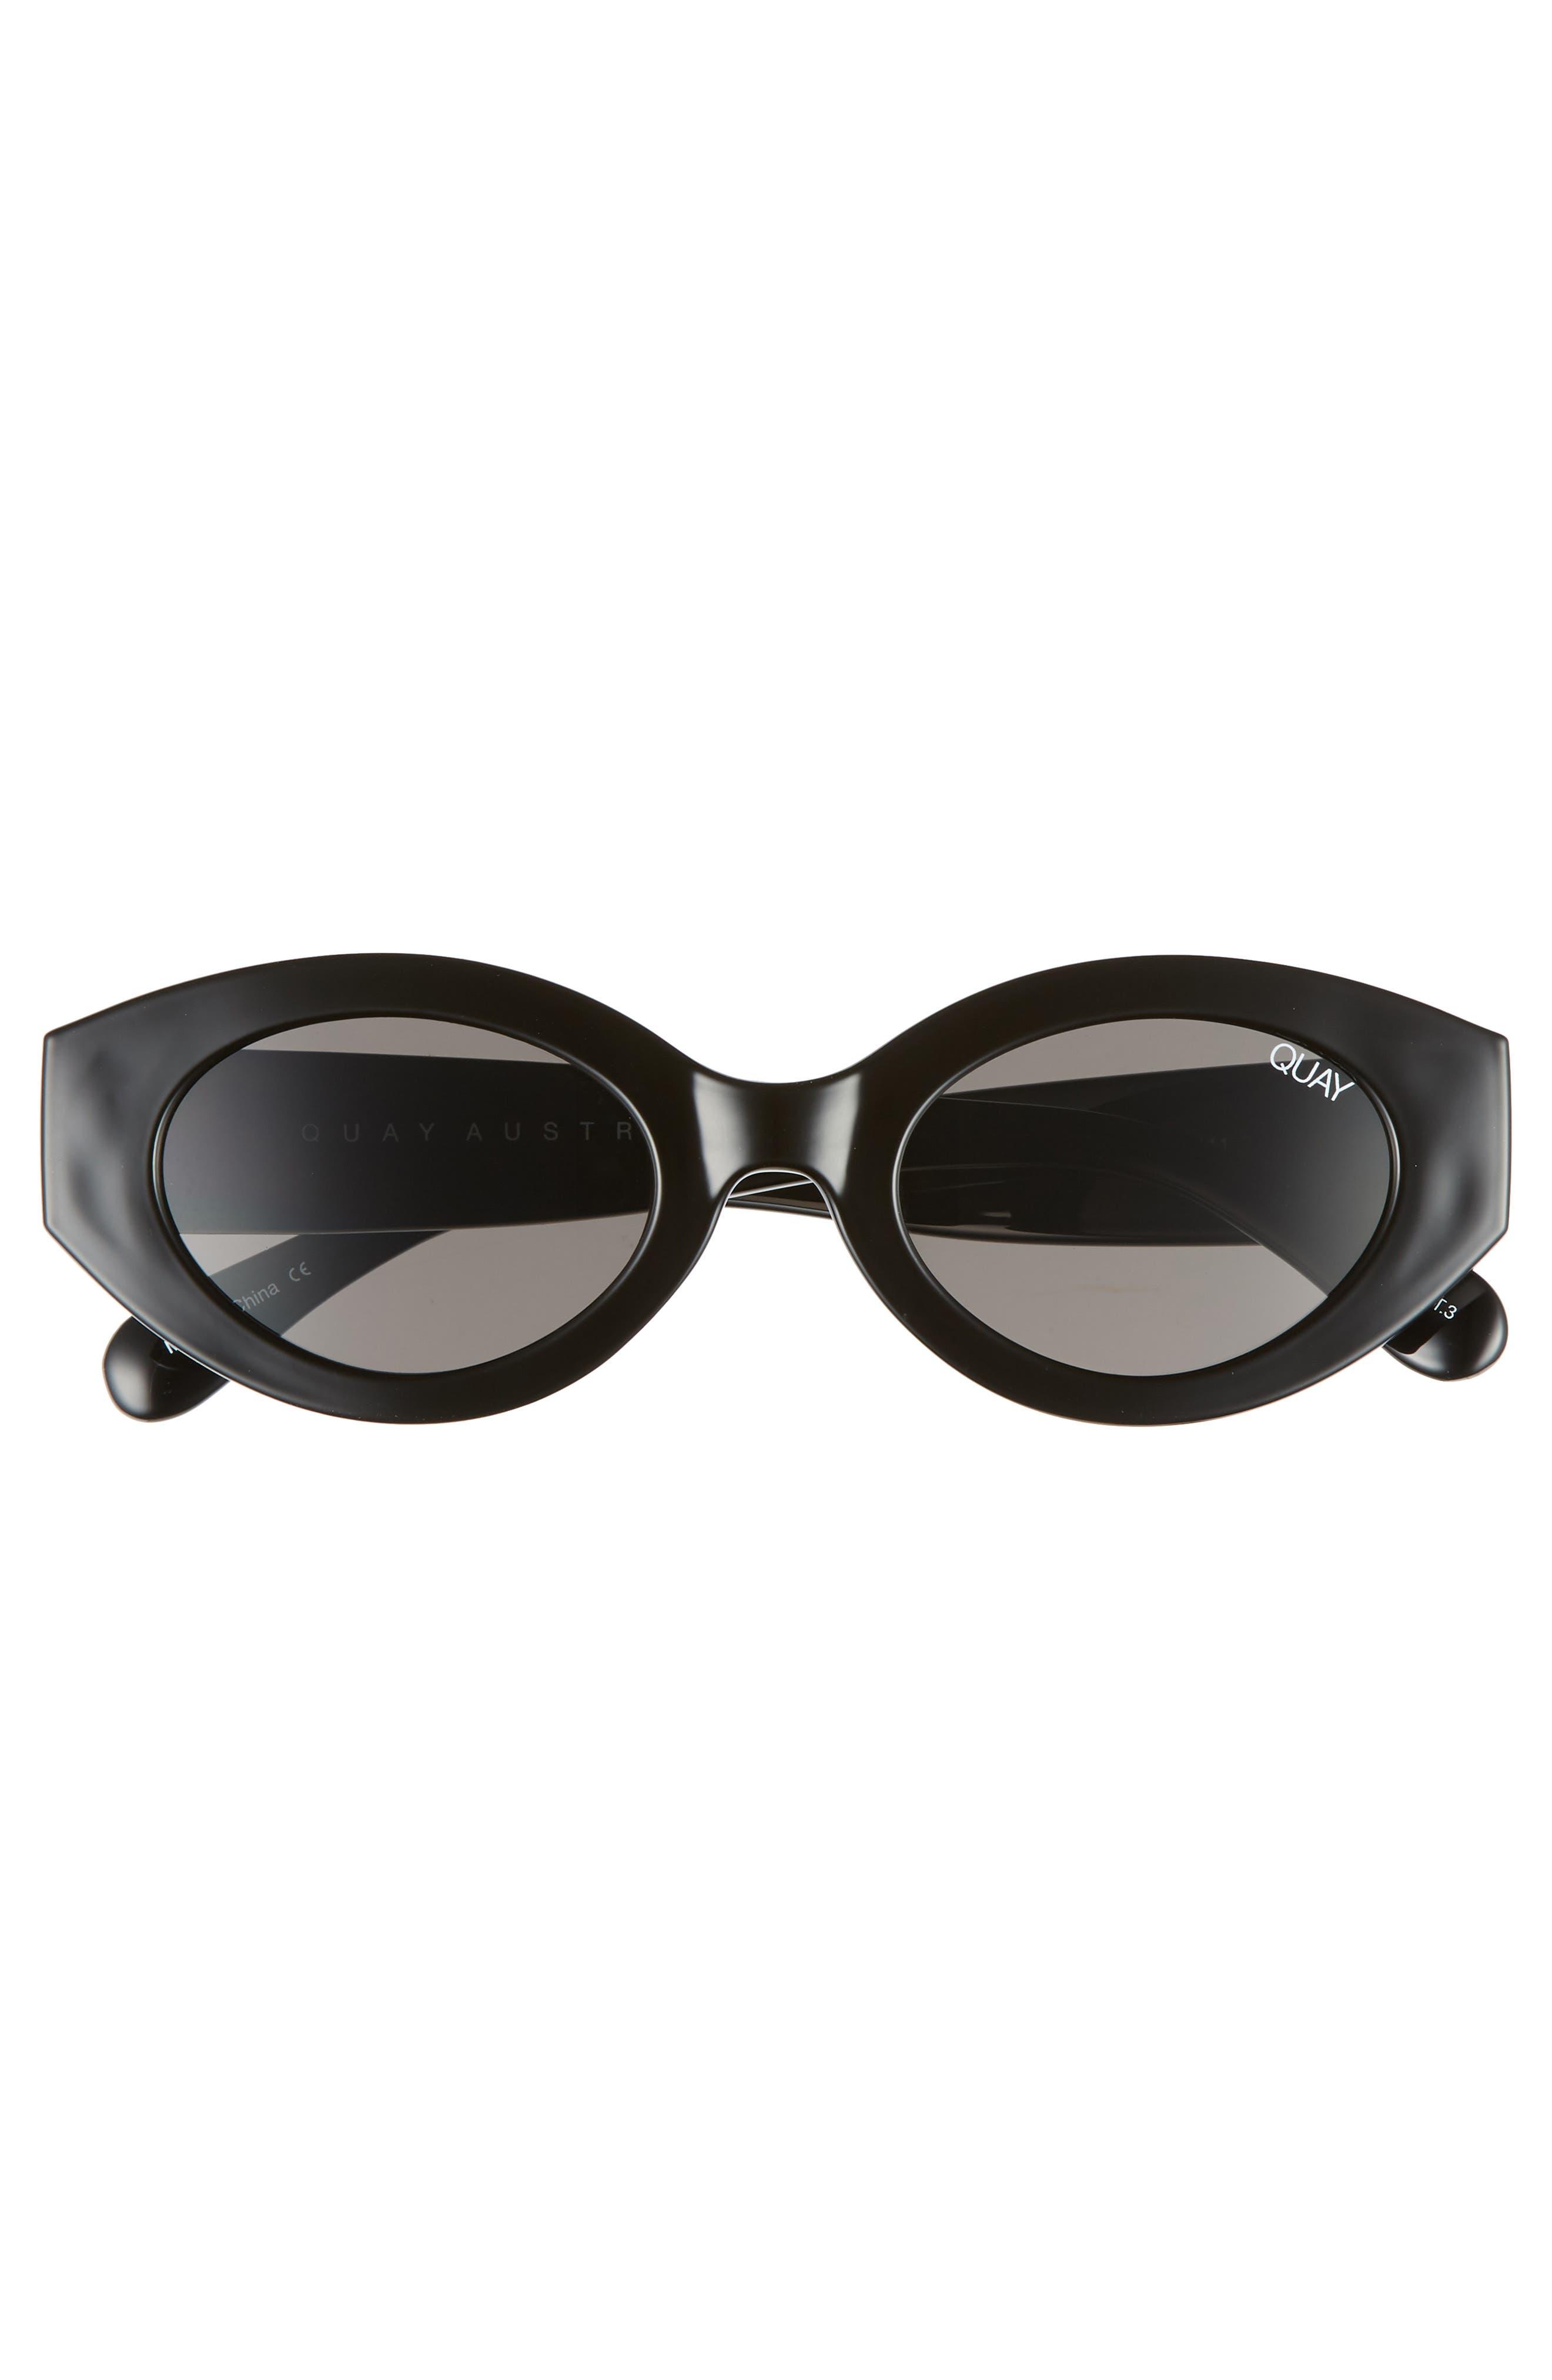 See Me Smile 50mm Cat Eye Sunglasses,                             Alternate thumbnail 4, color,                             Black/ Smoke